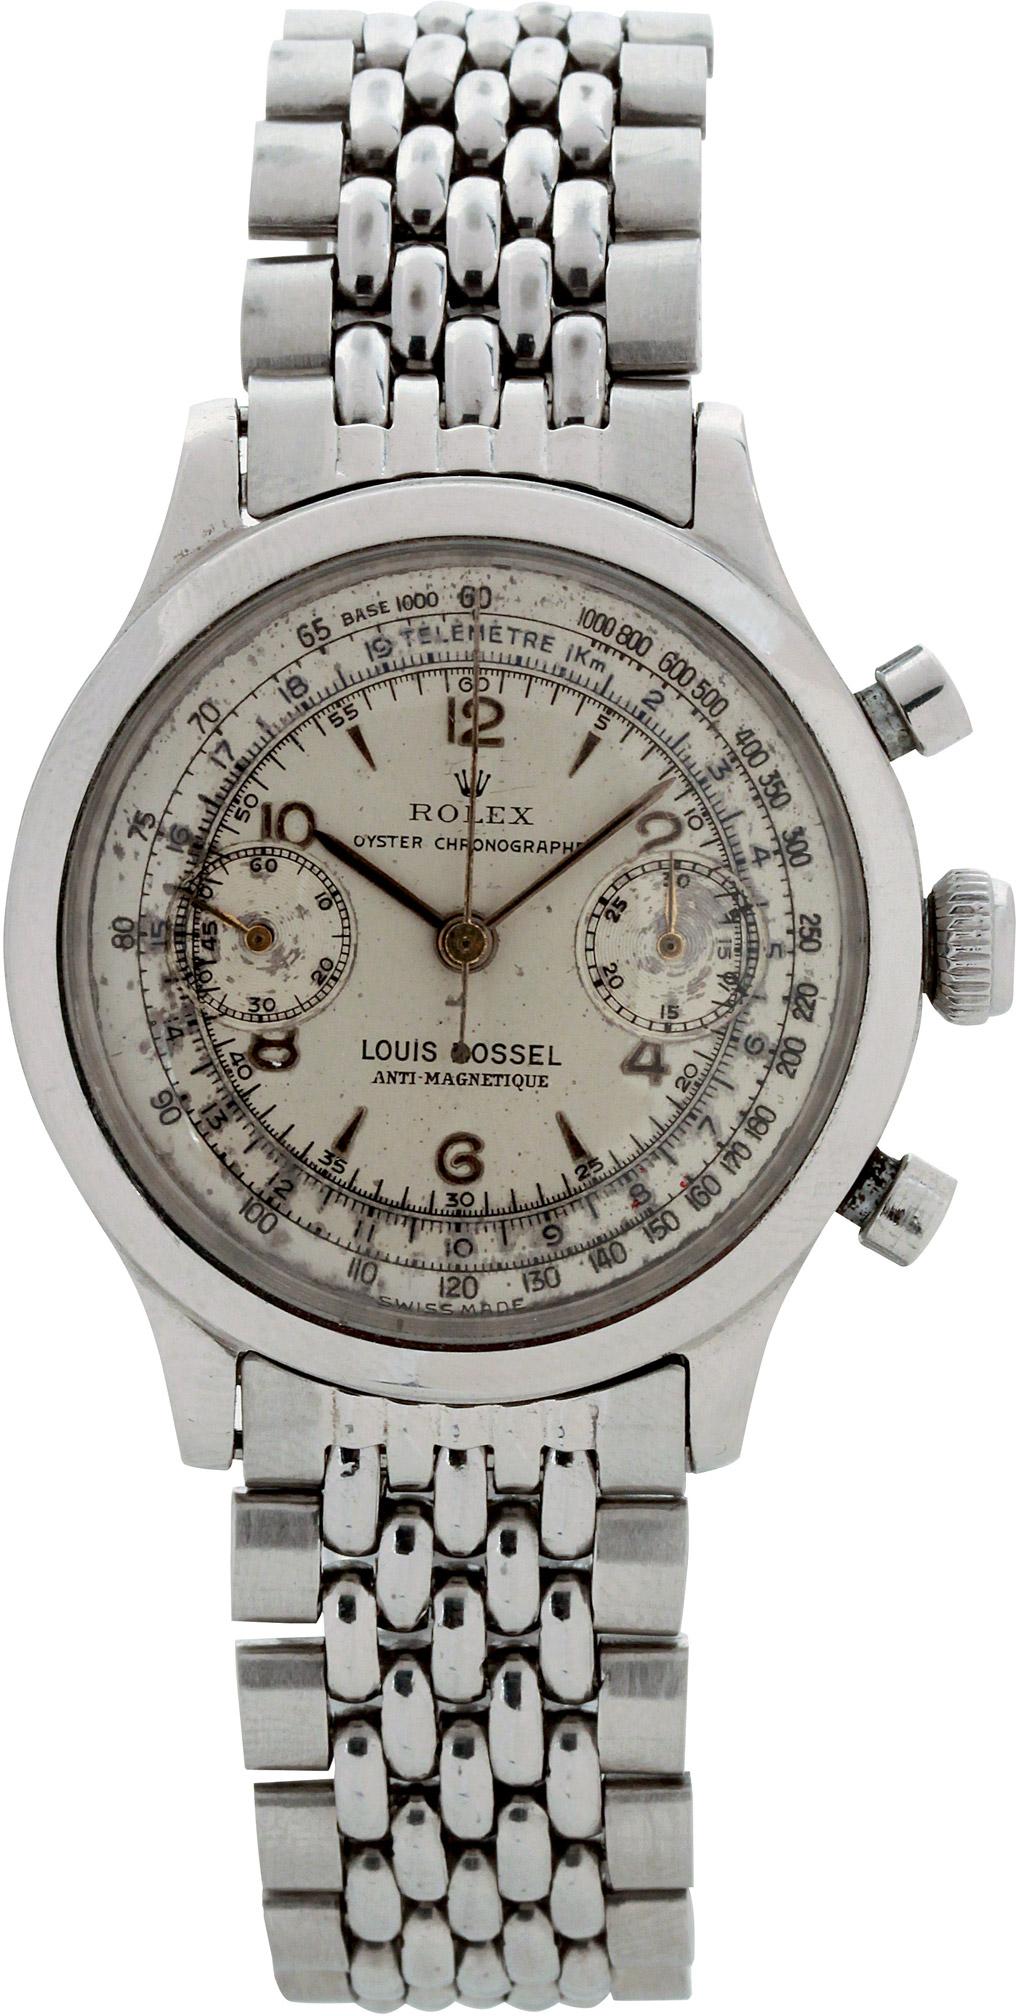 Cronografo Oyster pre-Daytona